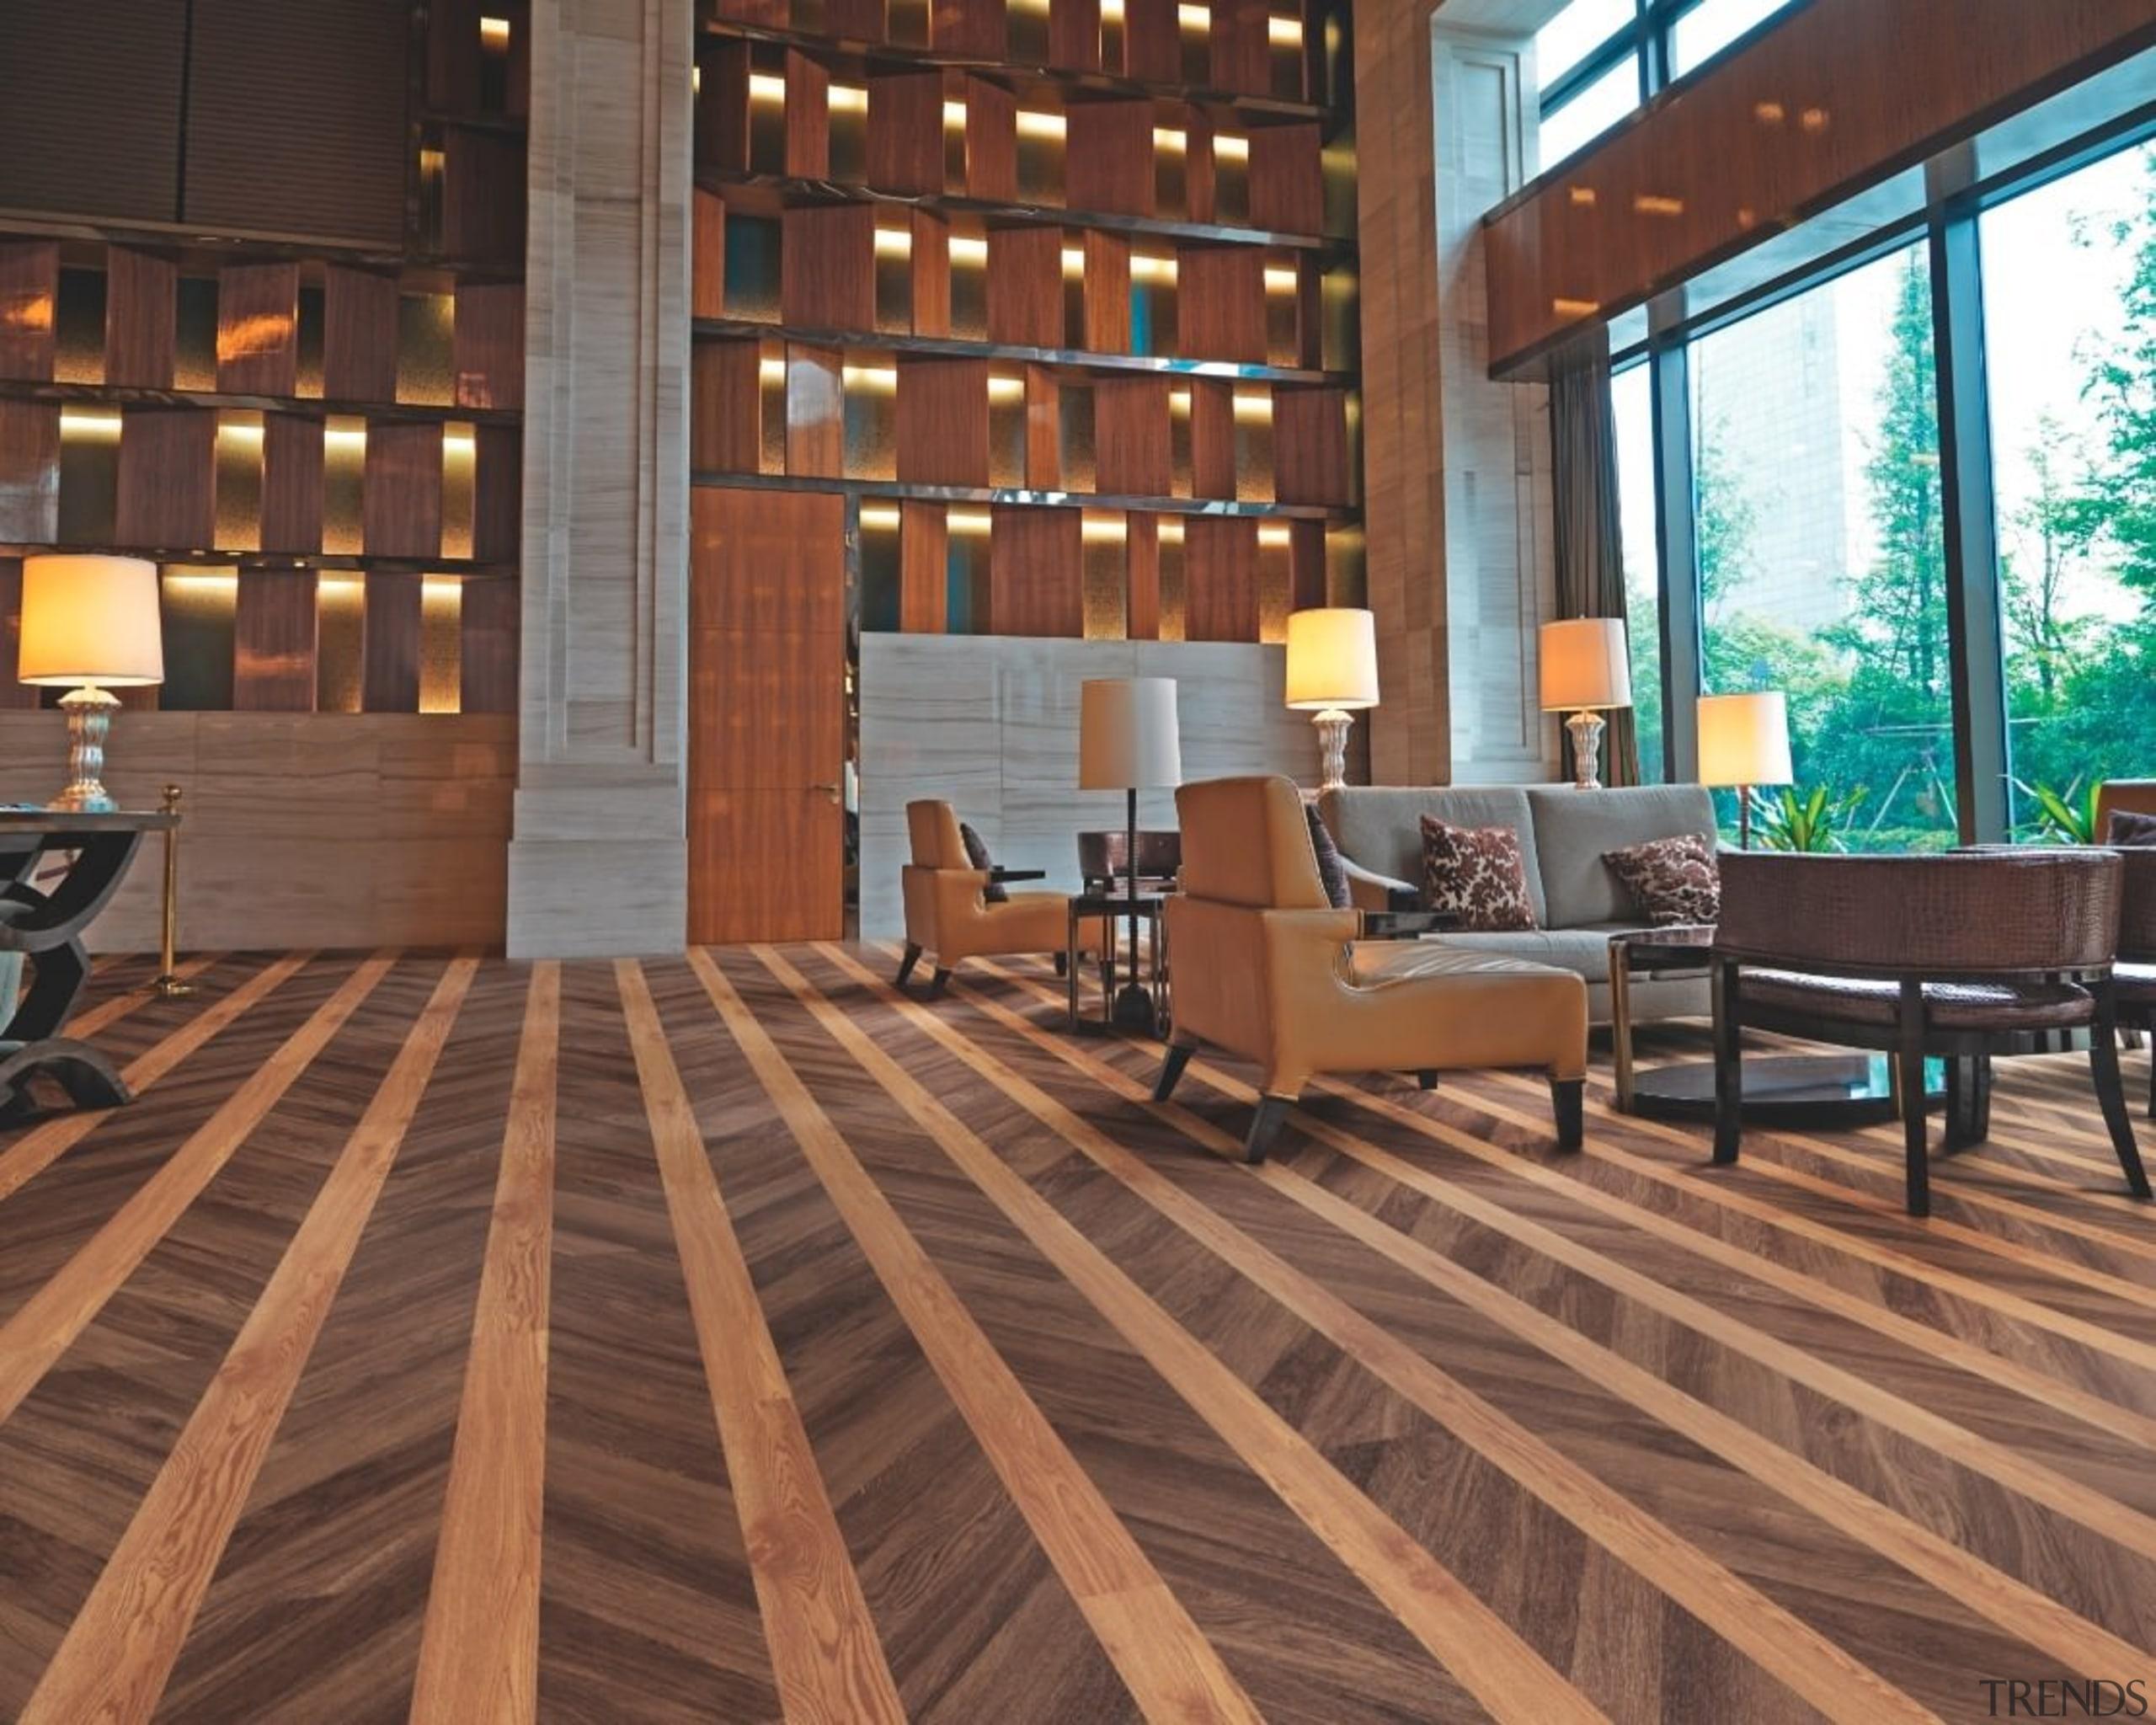 Polyflor Expona Commercial PUR is ideally suited to deck, floor, flooring, hardwood, interior design, laminate flooring, living room, wood, wood flooring, brown